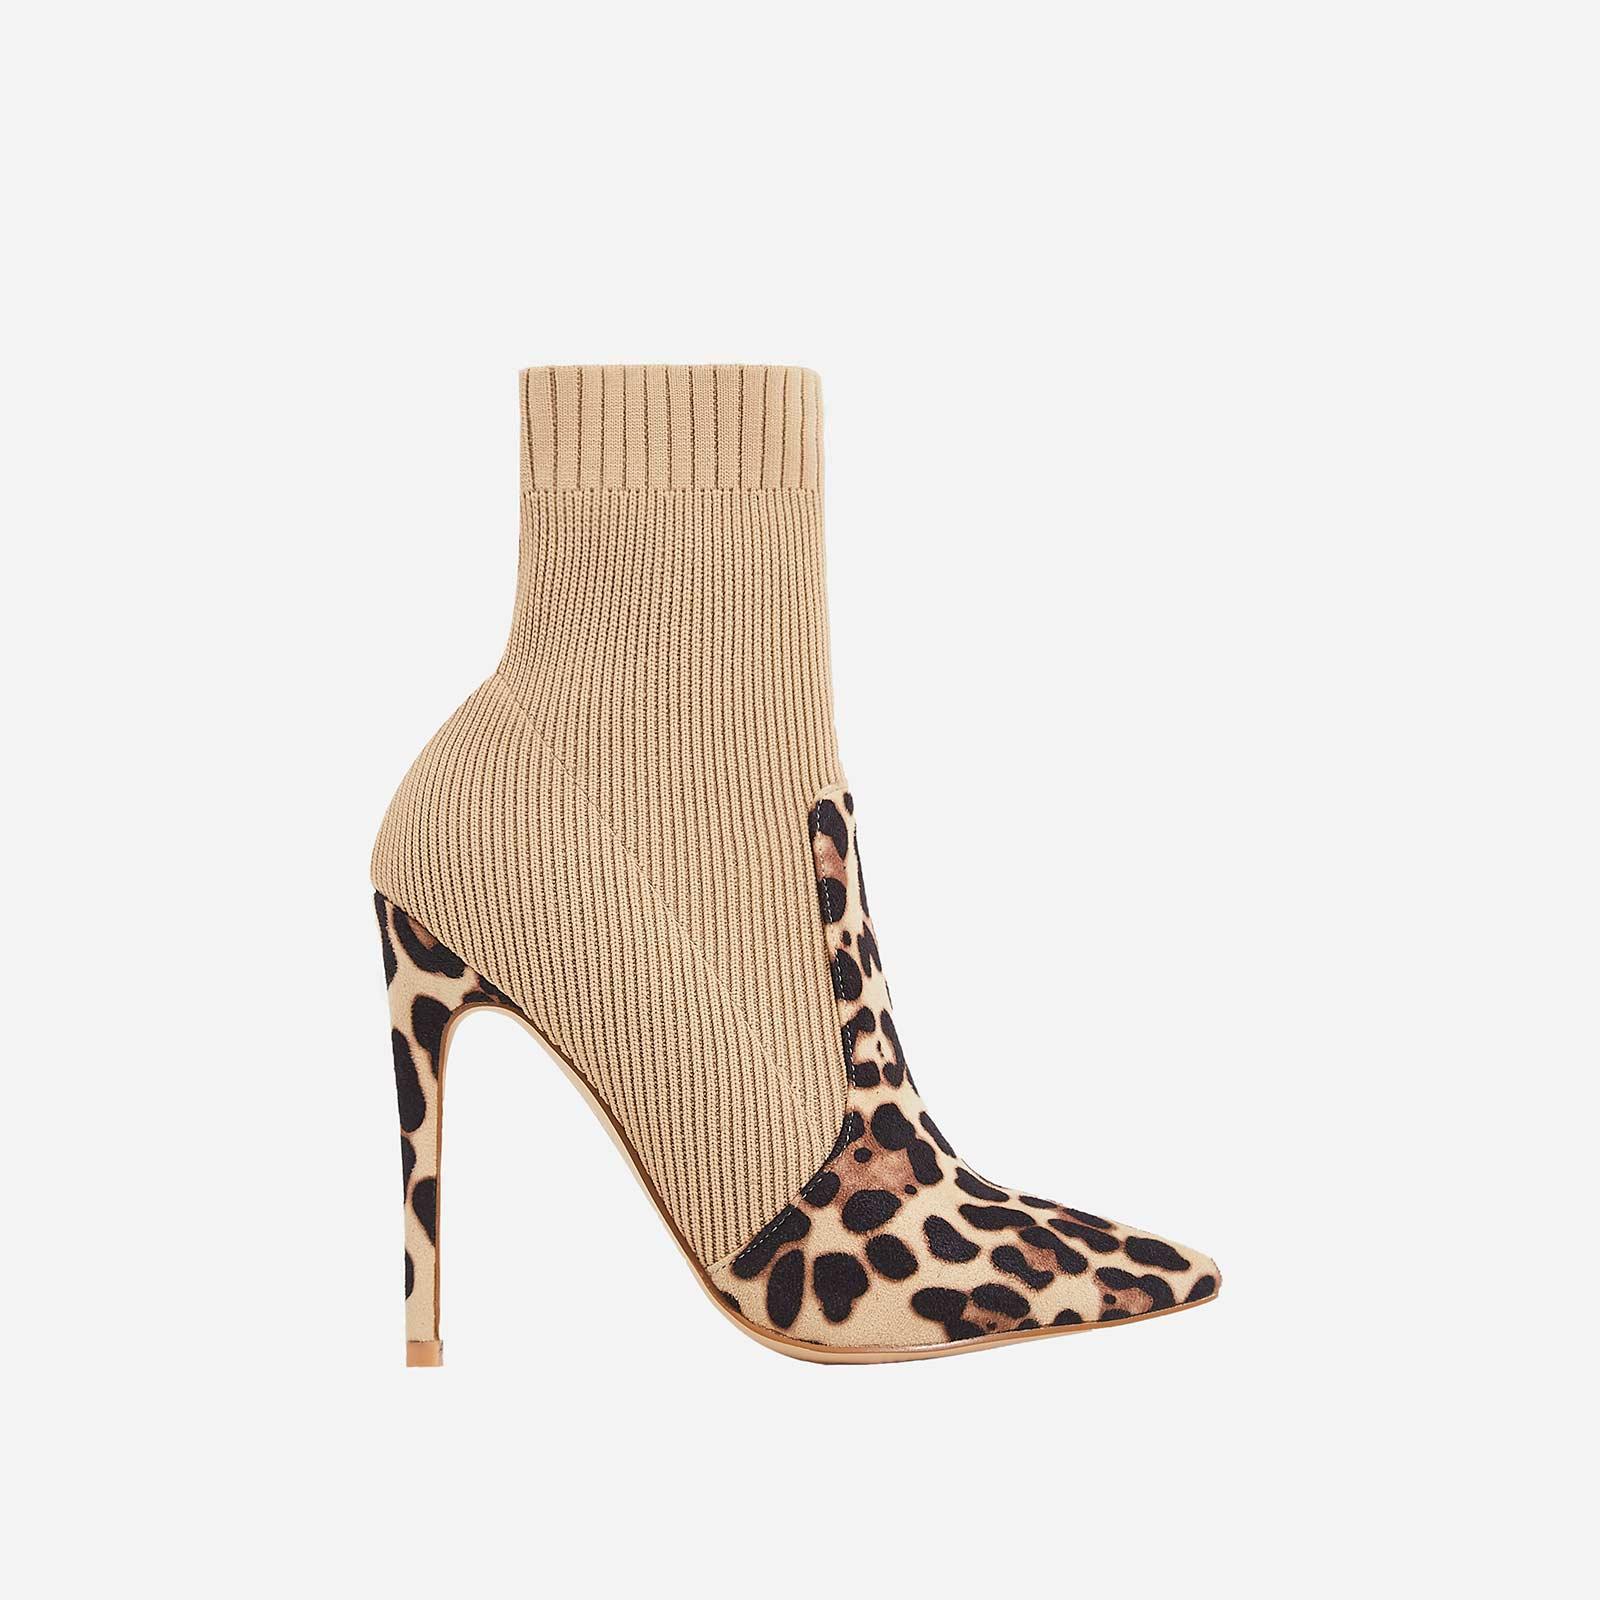 Phoenix Knitted Sock Boot In Tan Leopard Print Faux Suede